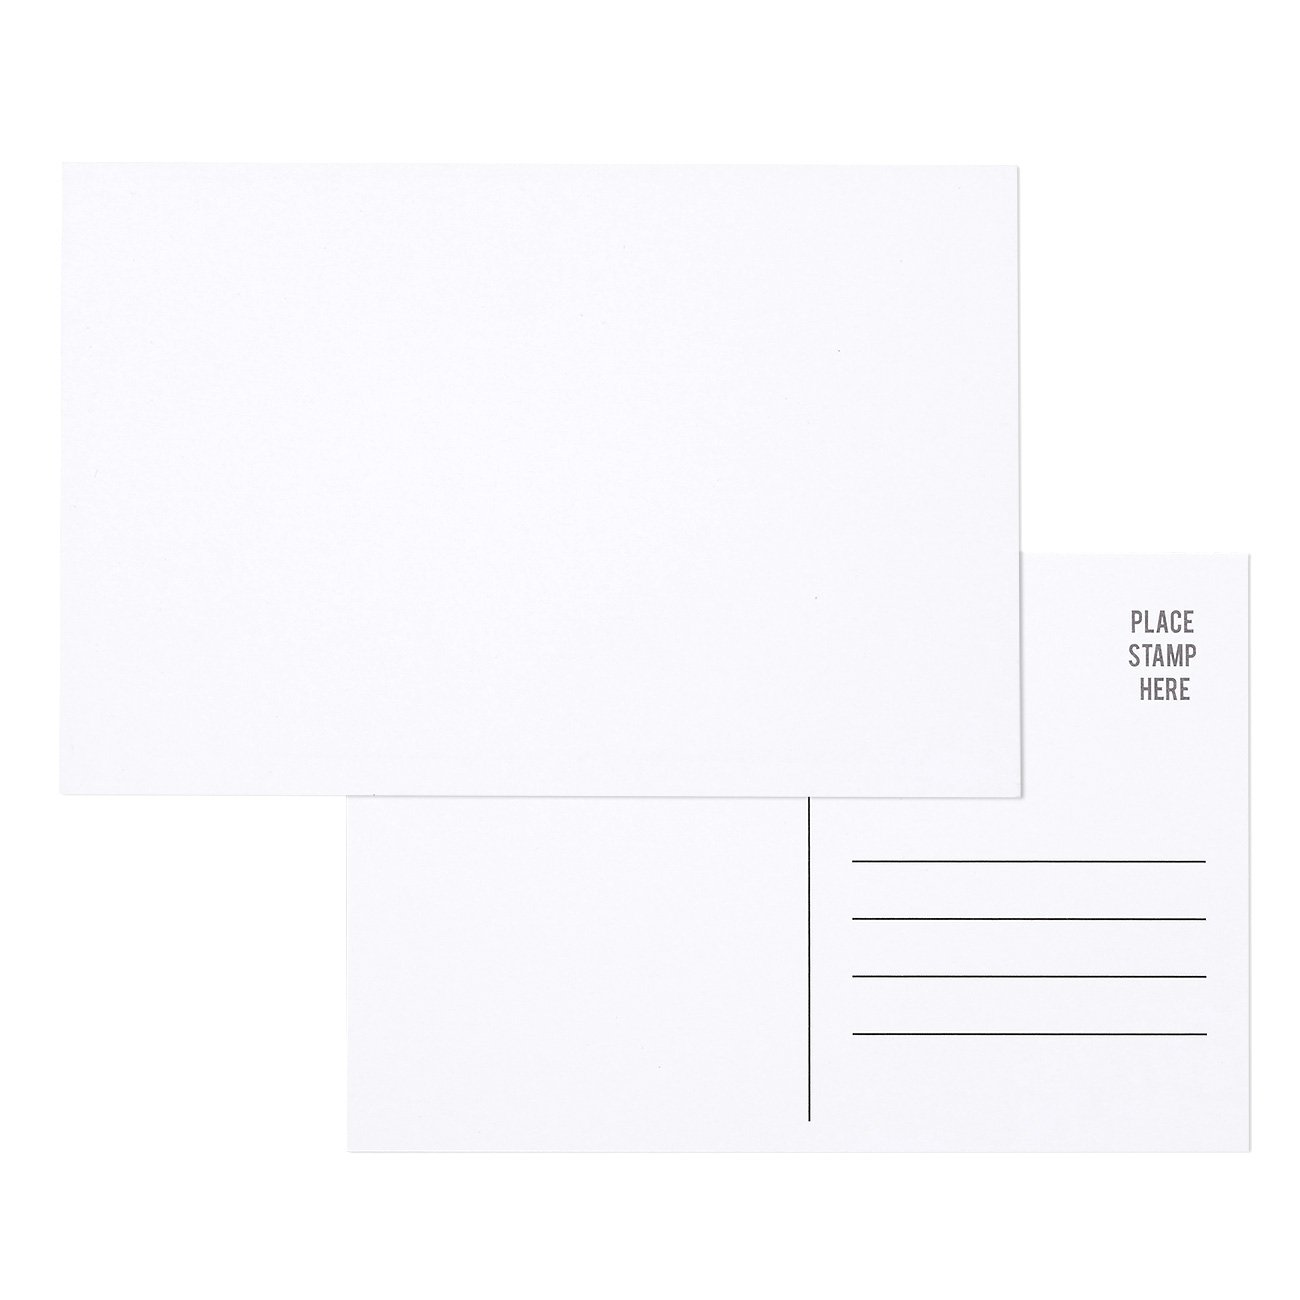 50 Stück Bulk Postkarten – blanko weiß 4 x 6 postversandfähigem ...